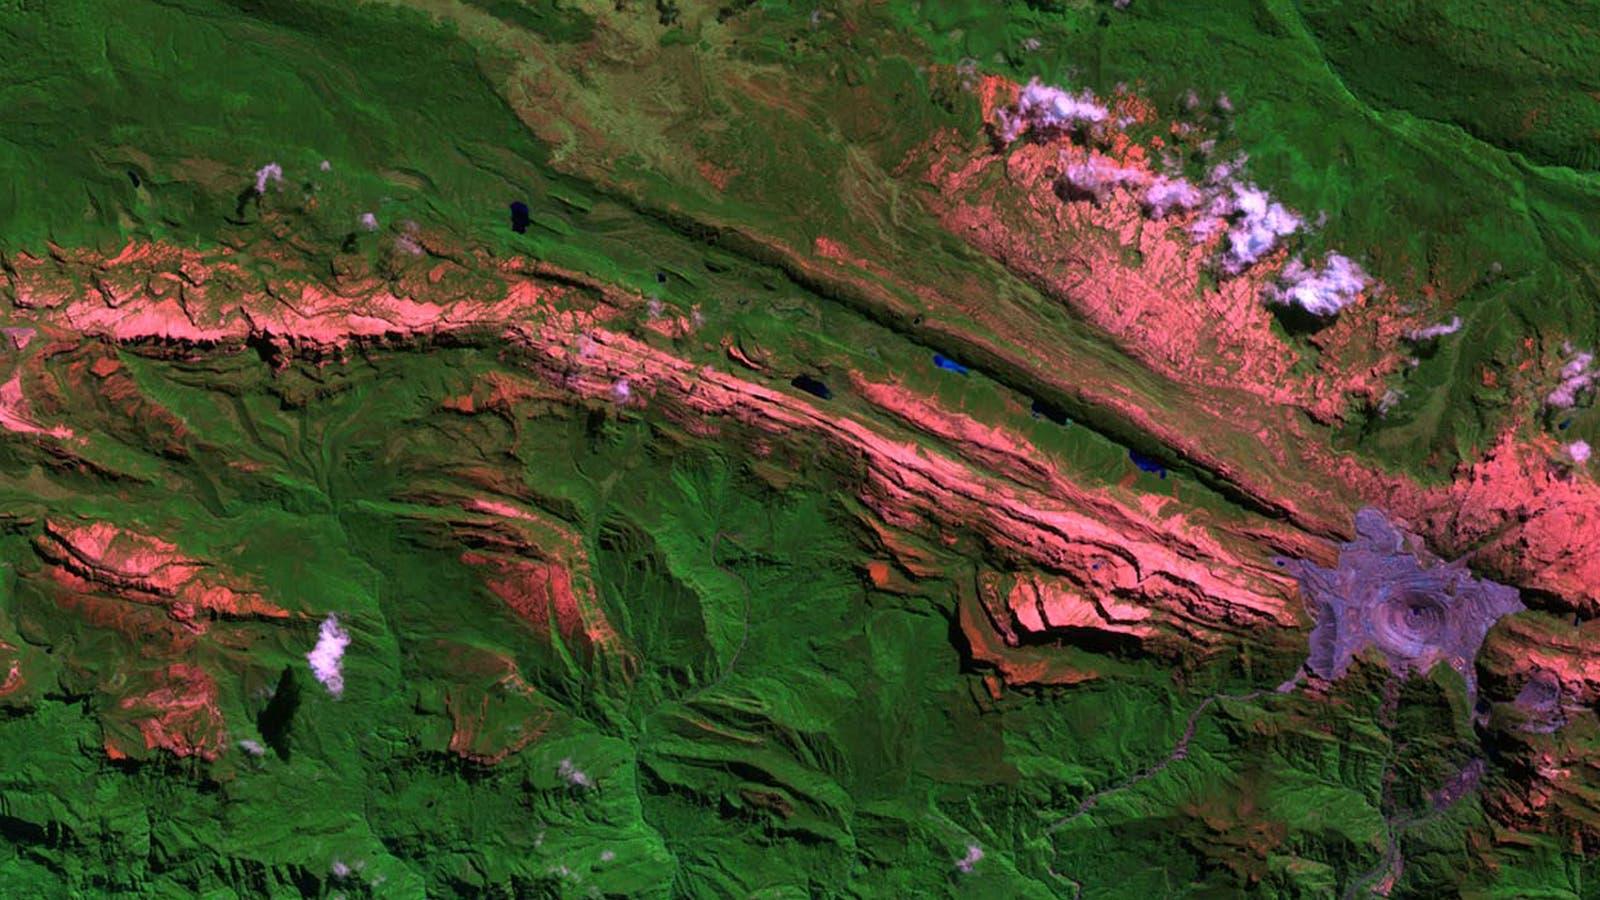 Puncak Jaya - mitten im Niemandsland